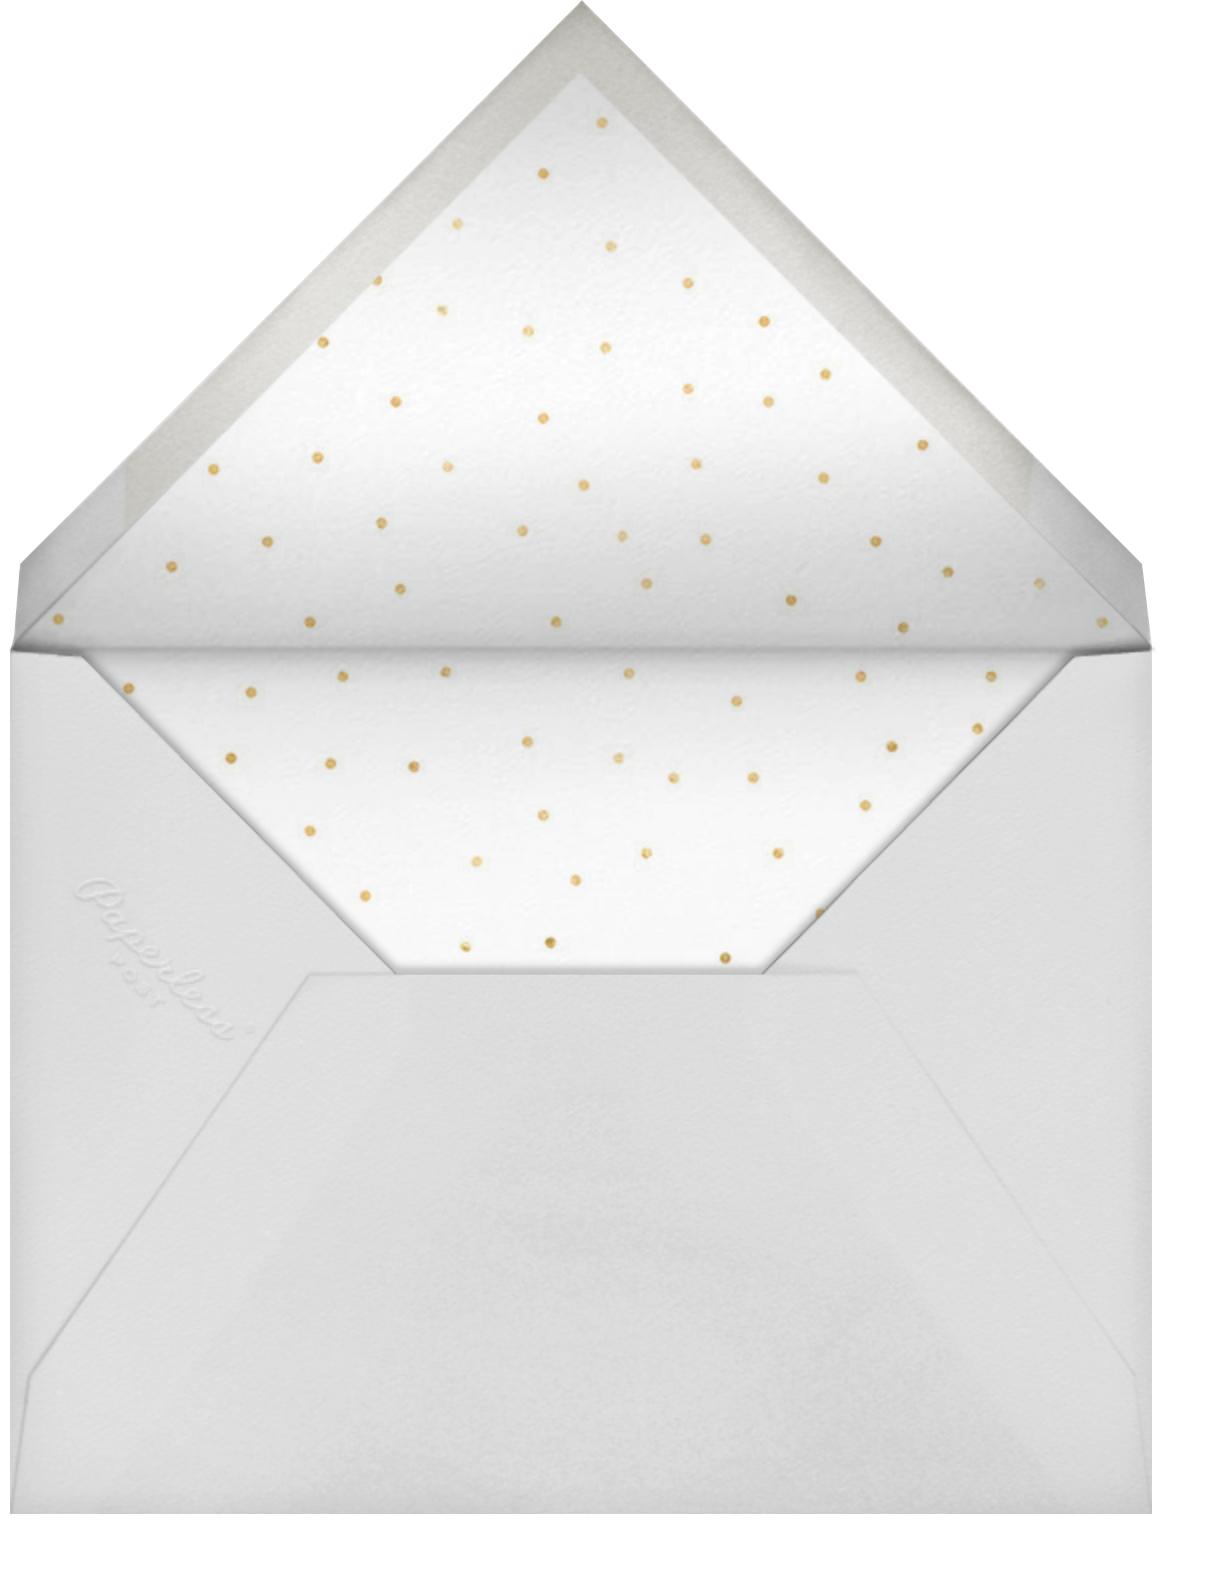 Simple Brushstroke - Sugar Paper - Eventbrite - envelope back